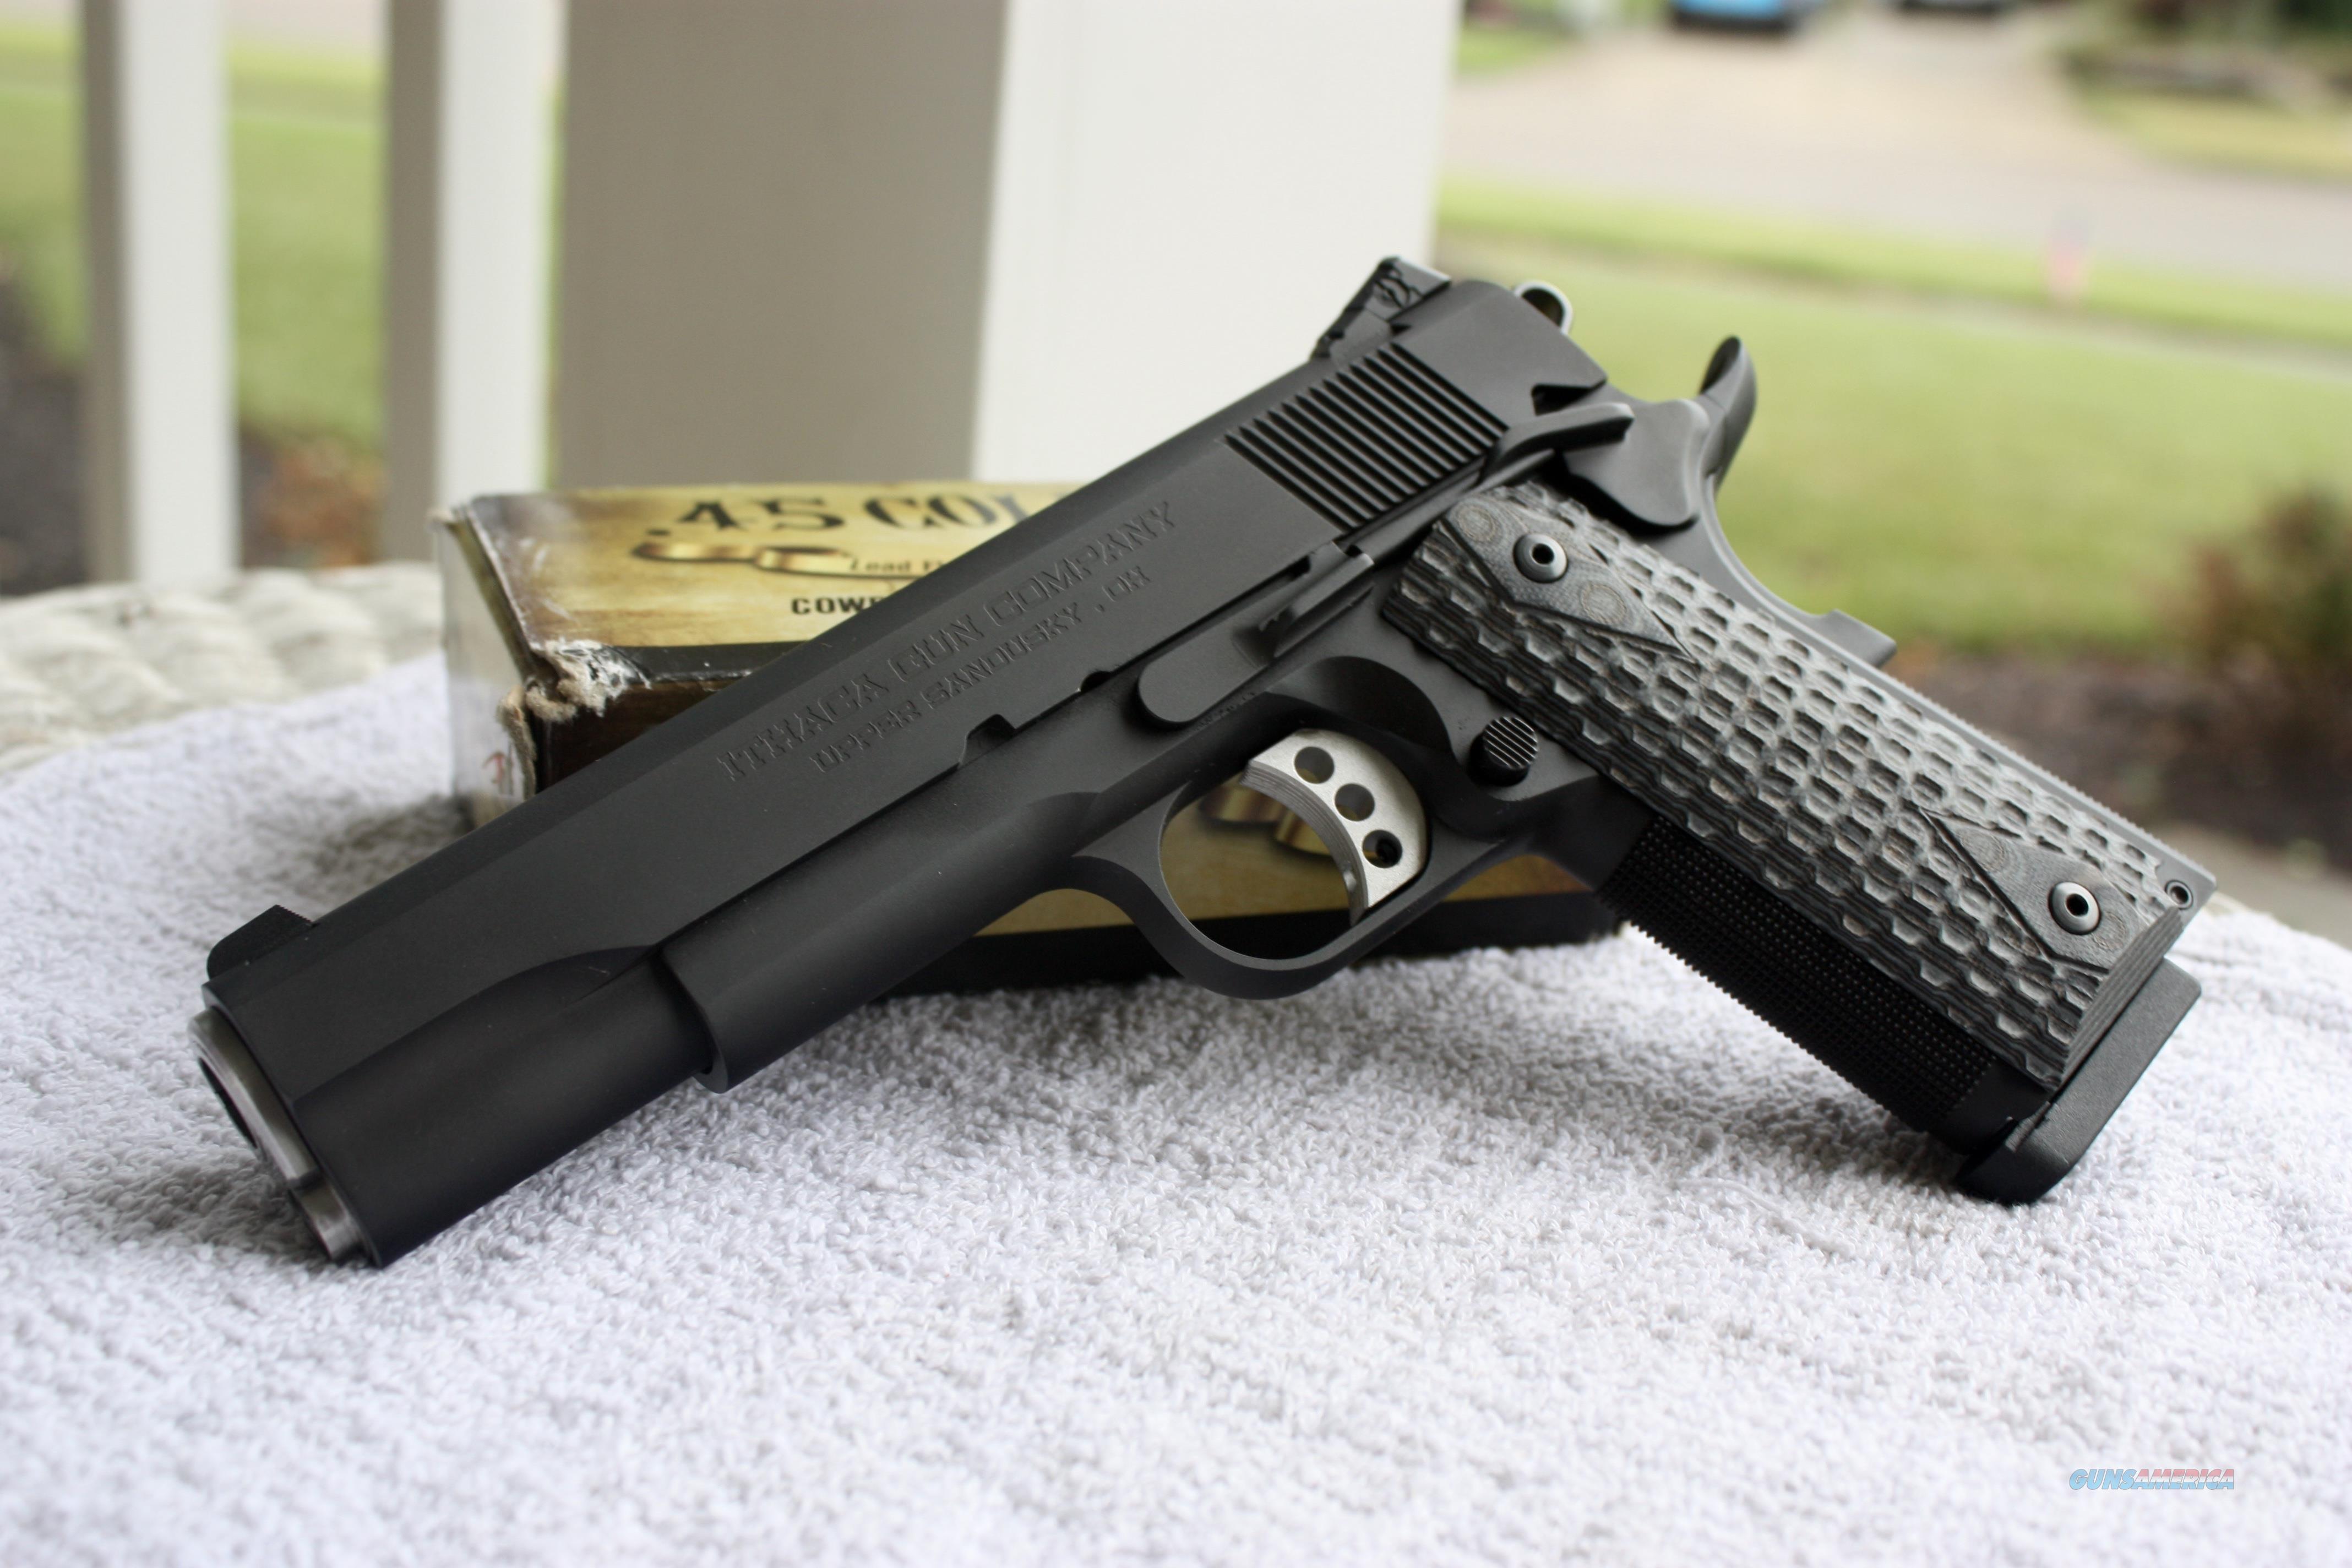 Ithaca M1911 .45 ACP Pistol 1911-C45G10A TWO CASES TWO GRIPS NIB  Guns > Pistols > Ithaca Pistols